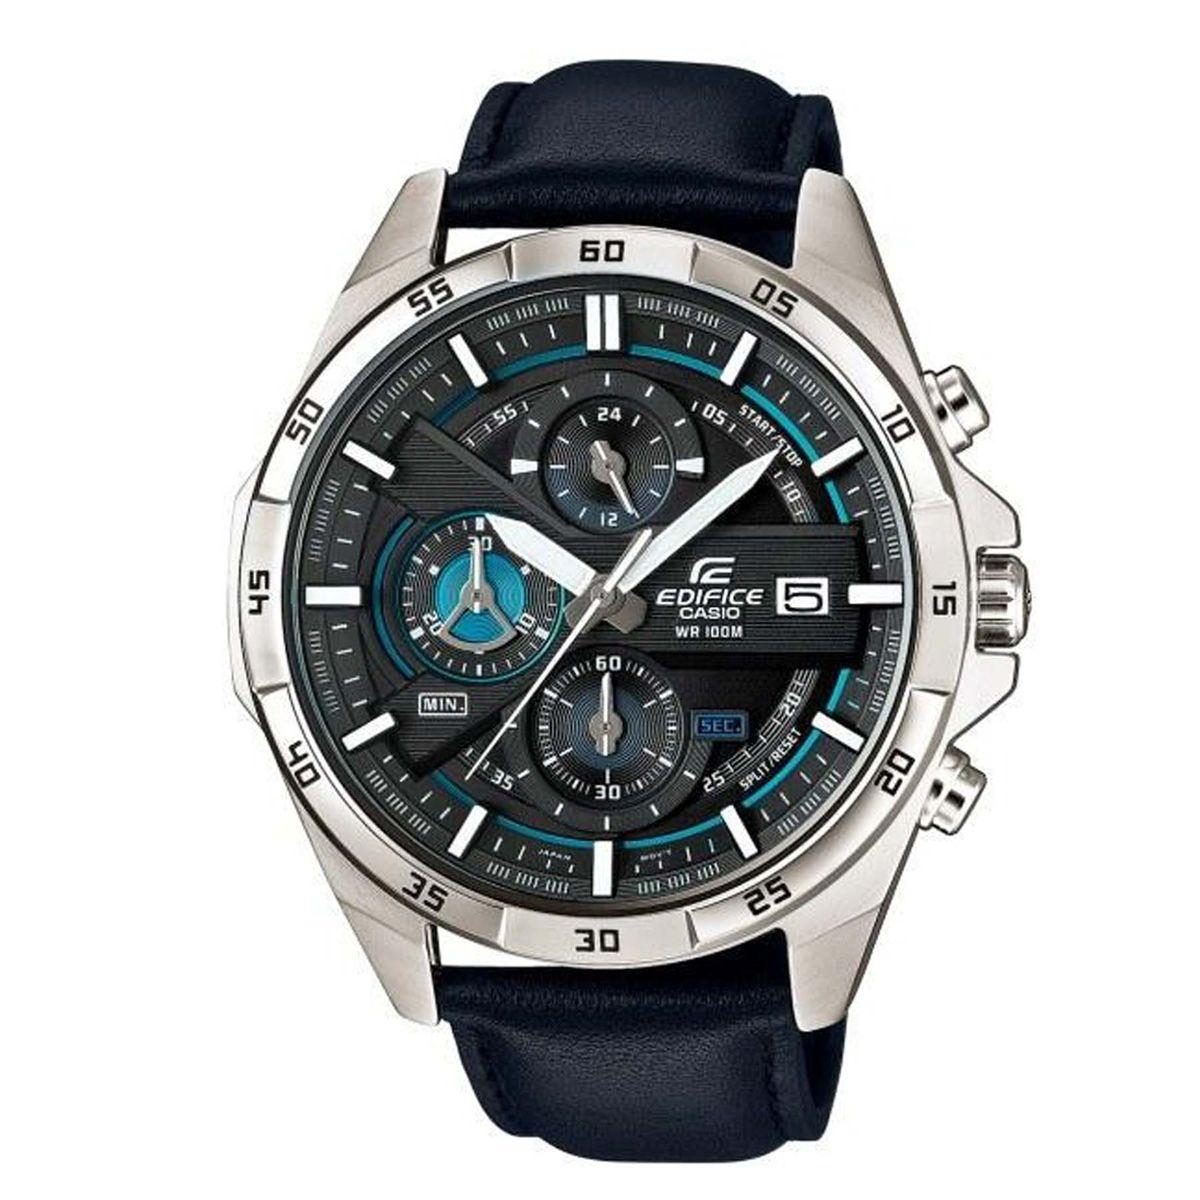 dd0df8bdbf8 Relógio Casio Edifice Cronografo Masculino Analógico 556L-1AVUDF Produto  não disponível